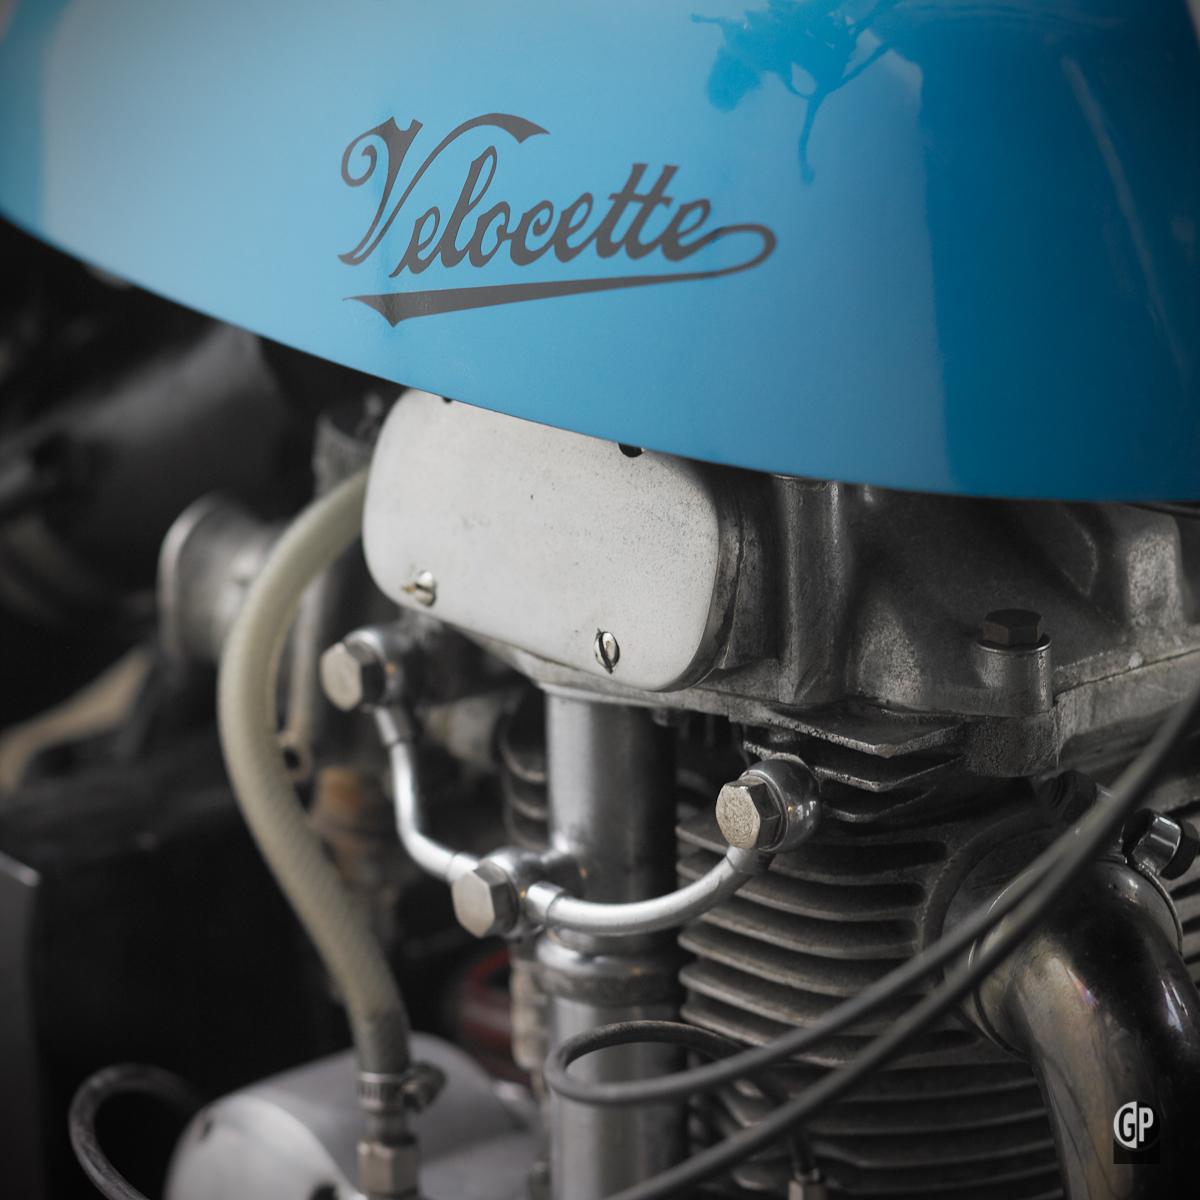 Velocette 500 Scrambler via Southsiders